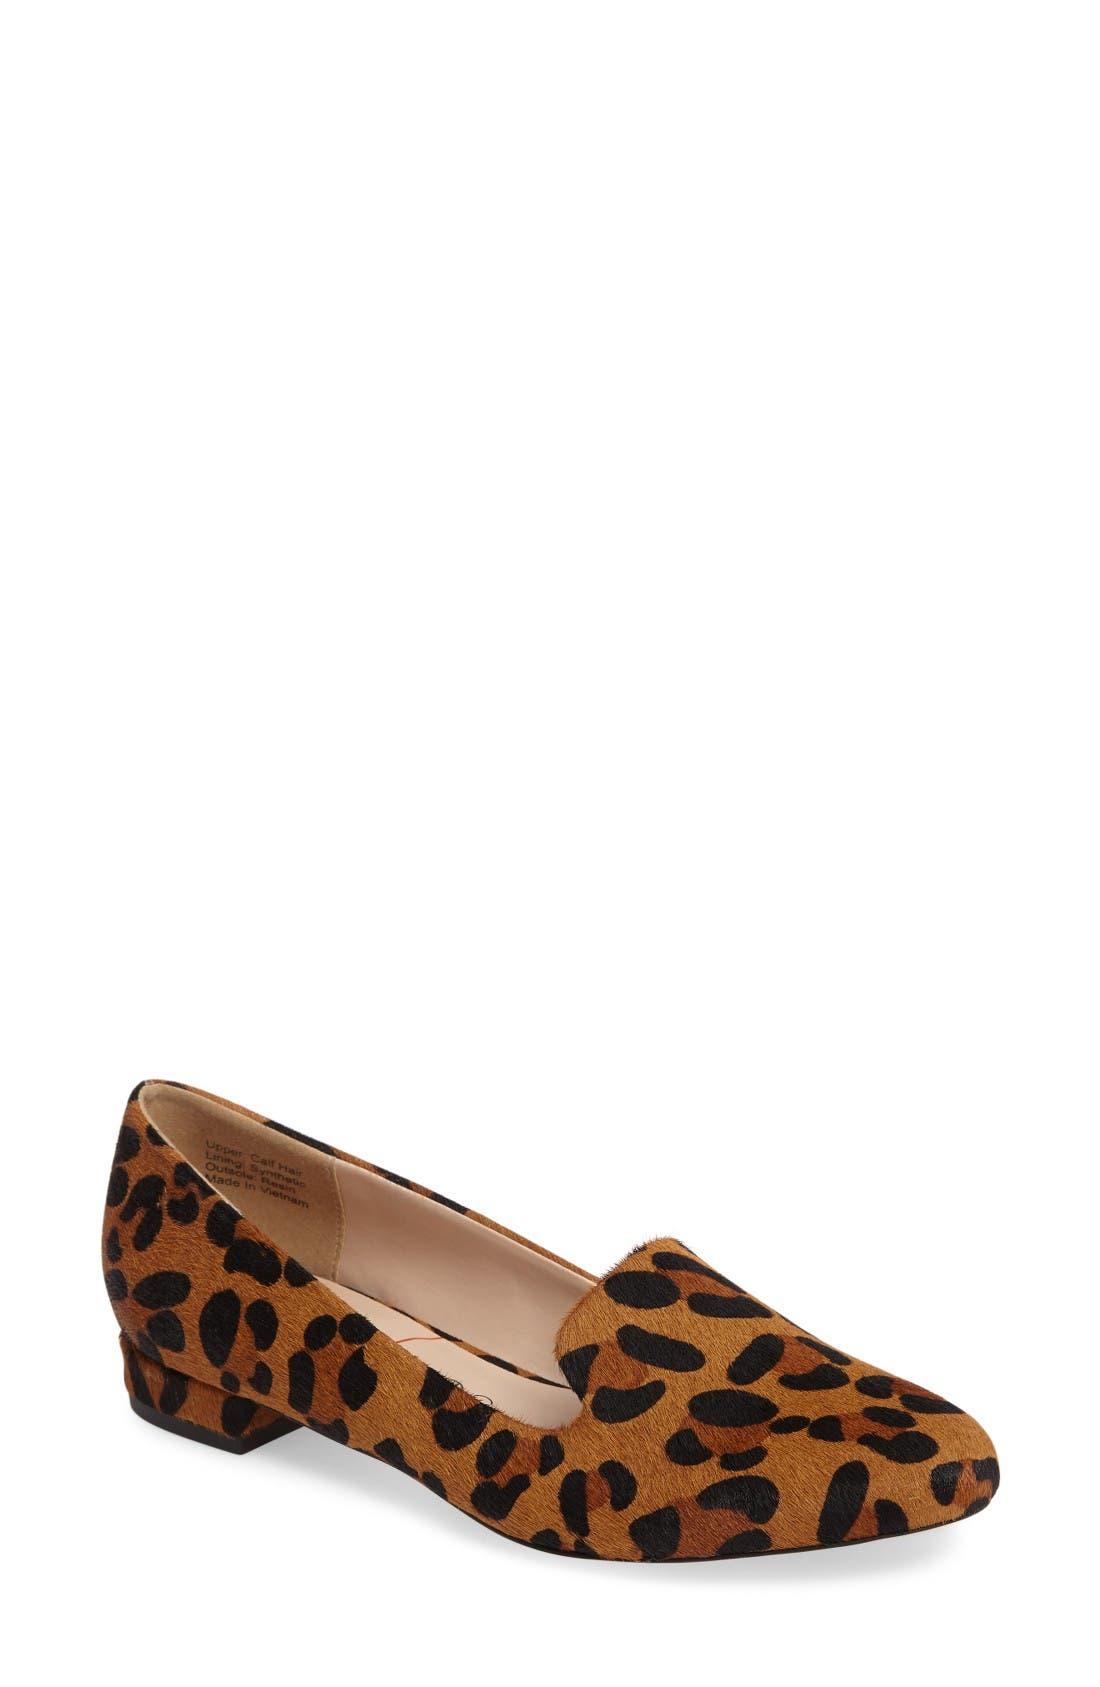 Nitsa Genuine Calf Hair Loafer,                             Main thumbnail 1, color,                             Leopard